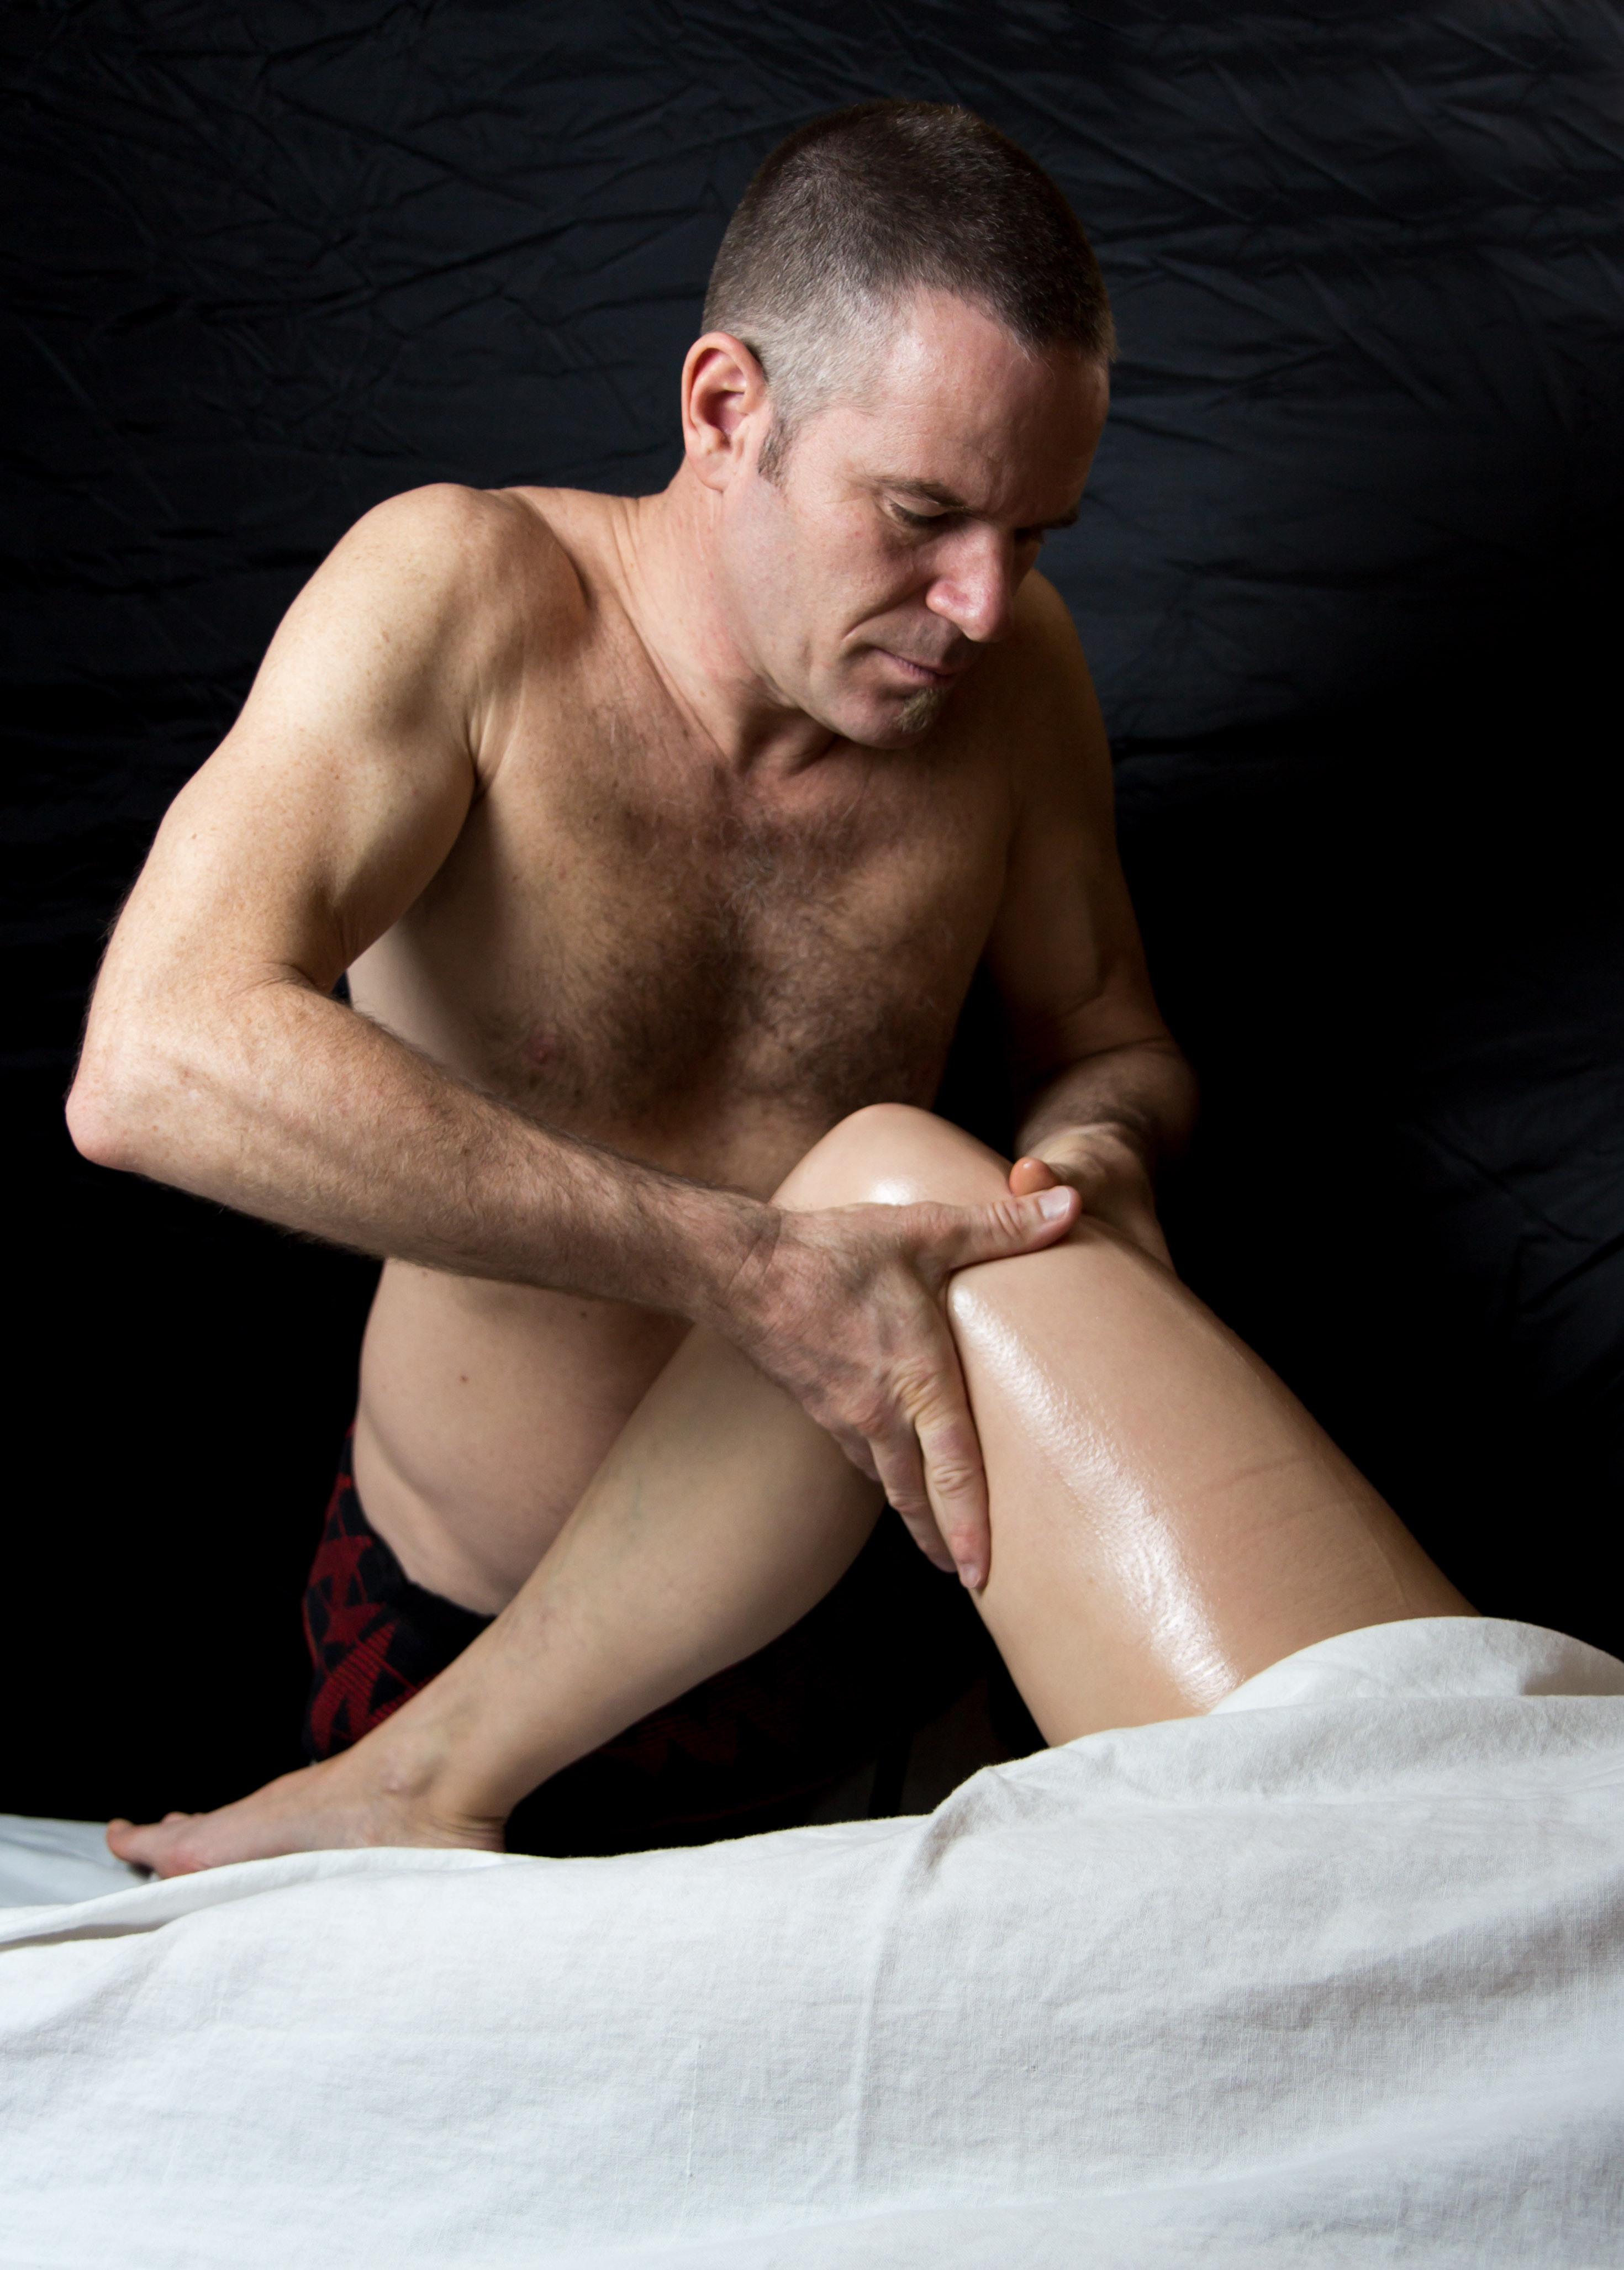 massage thai århus tao tantra massage frederiksberg